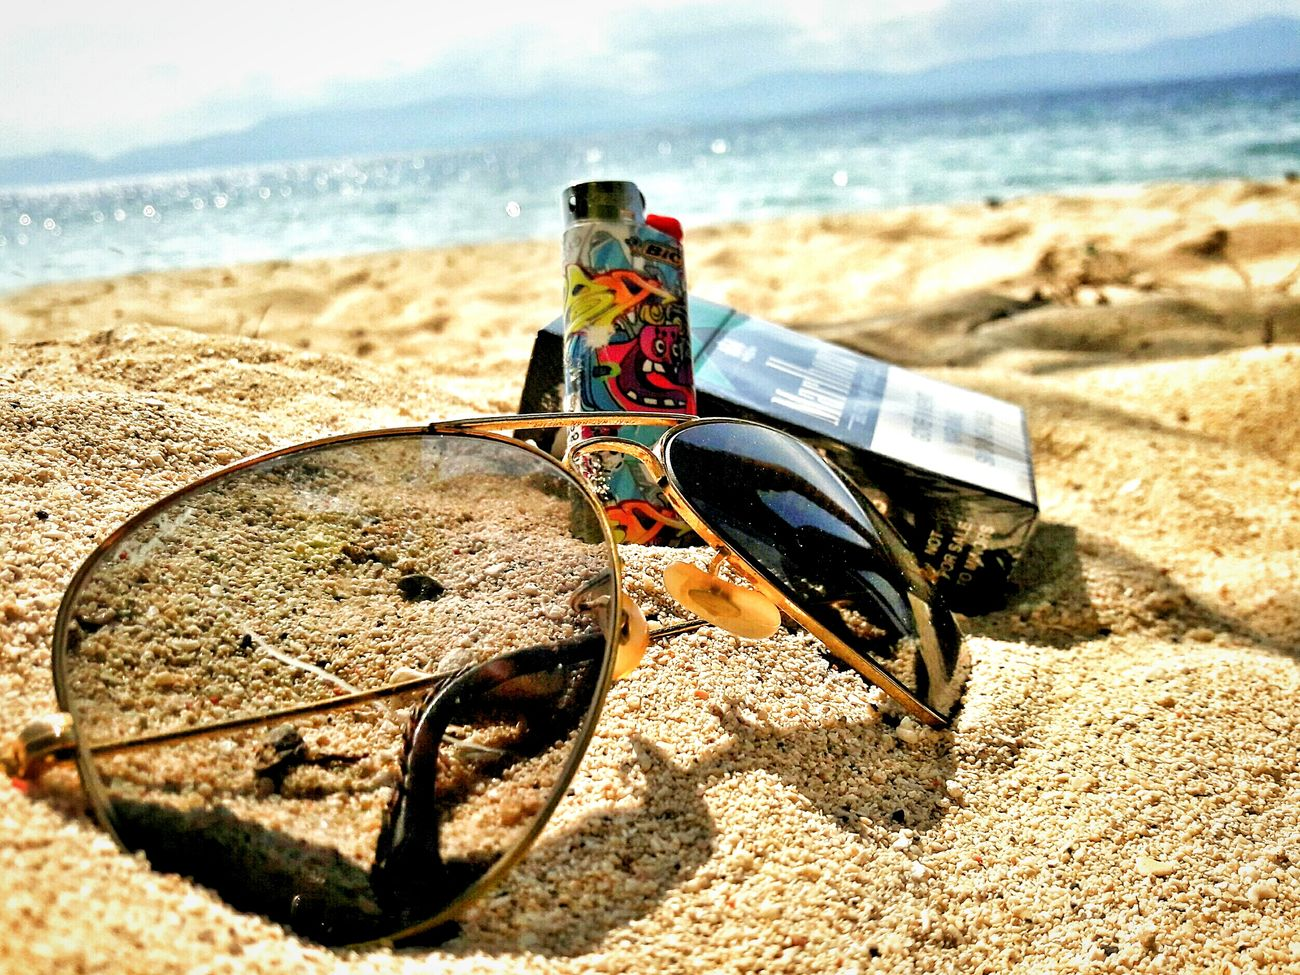 SmokingSummerGlasses 16th Beachbreak Summerfeeling Laxnotlazy Phoneography